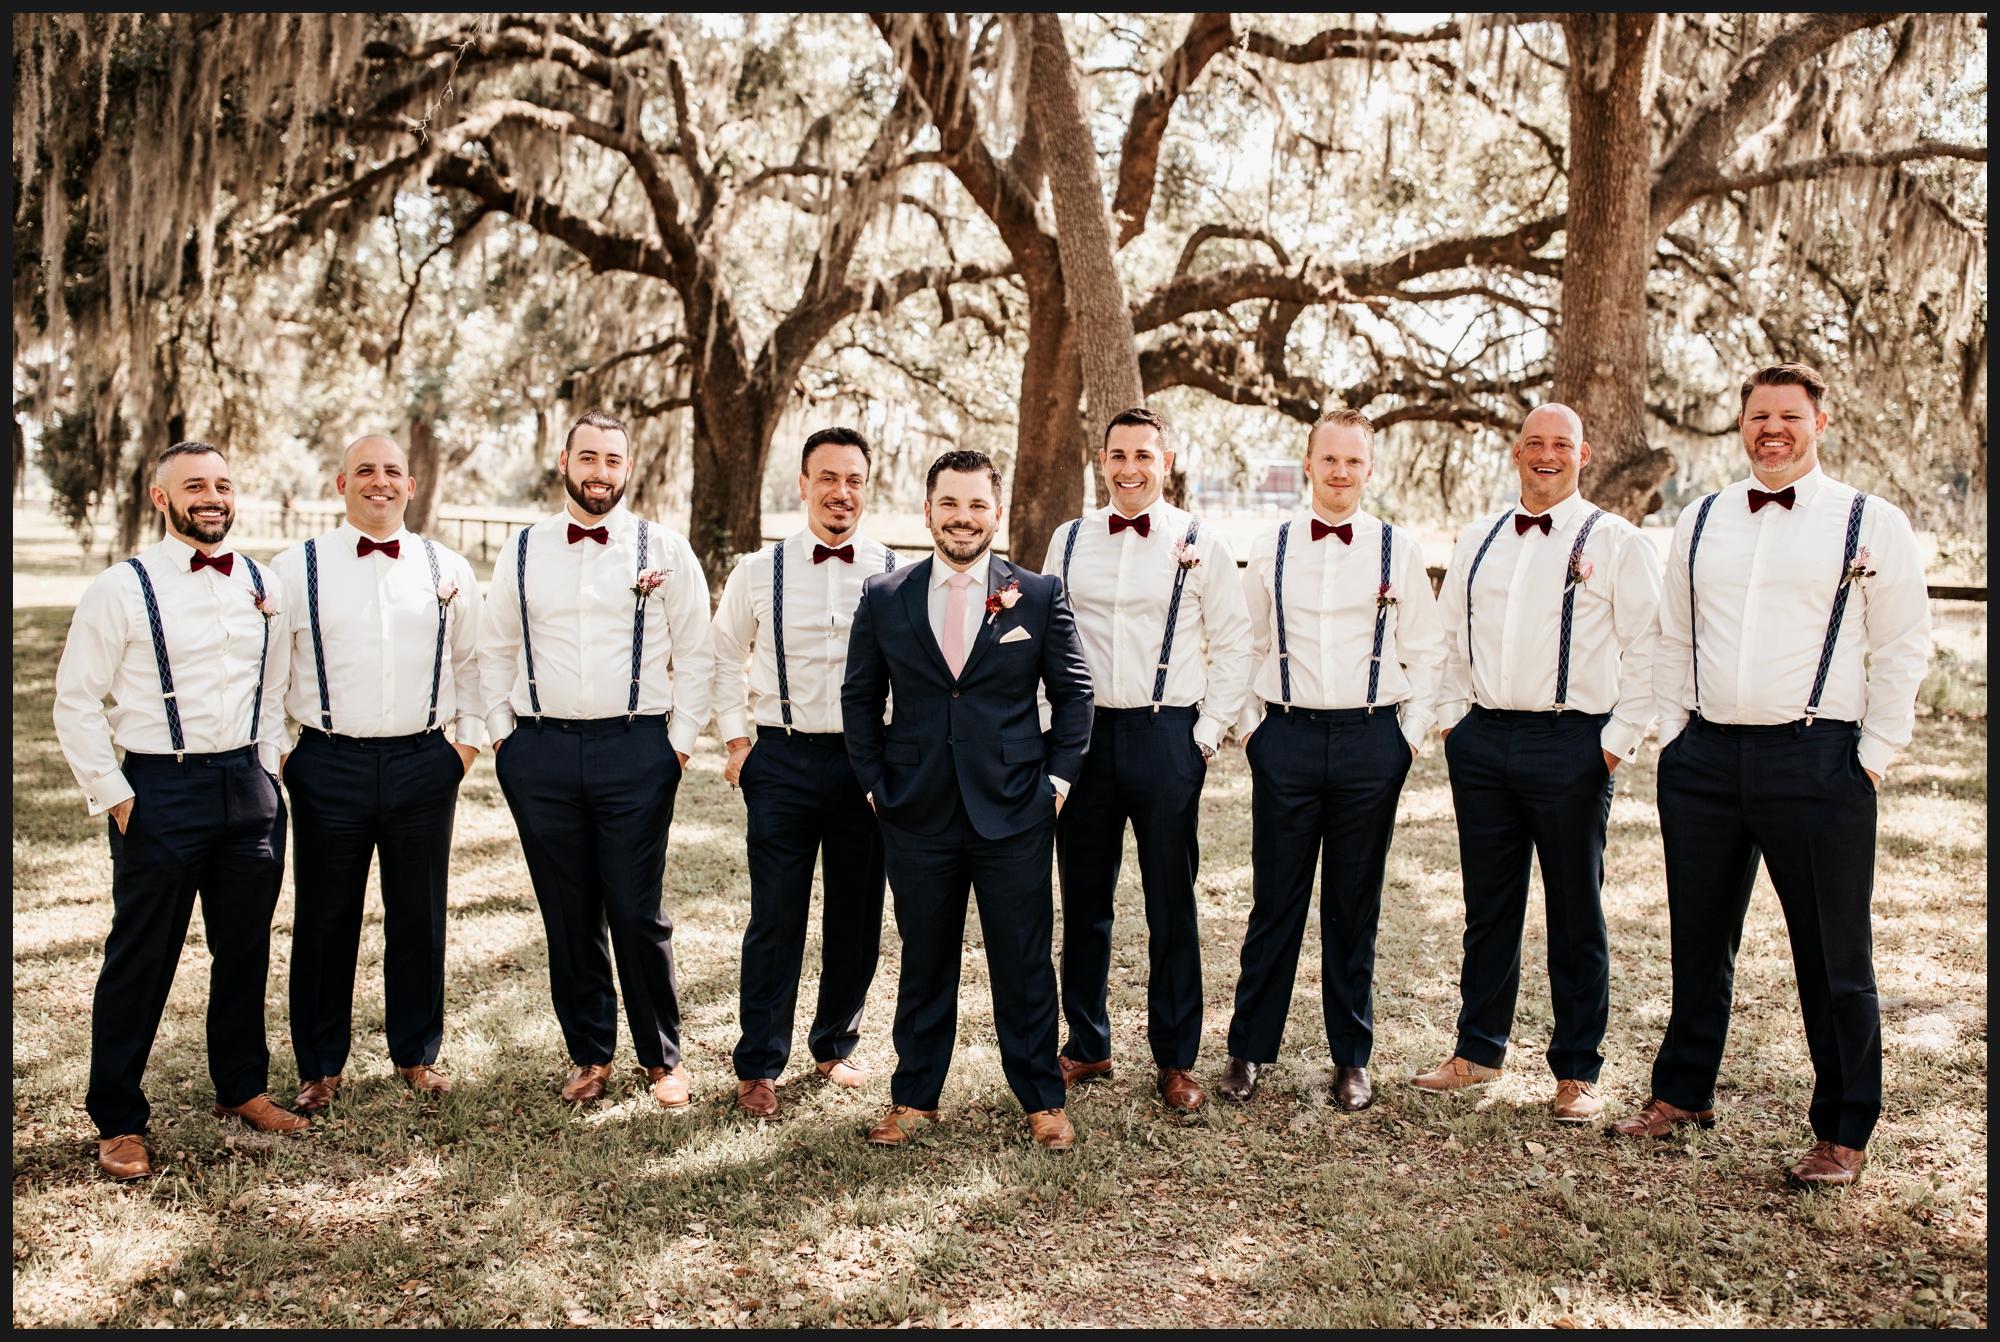 Orlando-Wedding-Photographer-destination-wedding-photographer-florida-wedding-photographer-hawaii-wedding-photographer_0582.jpg